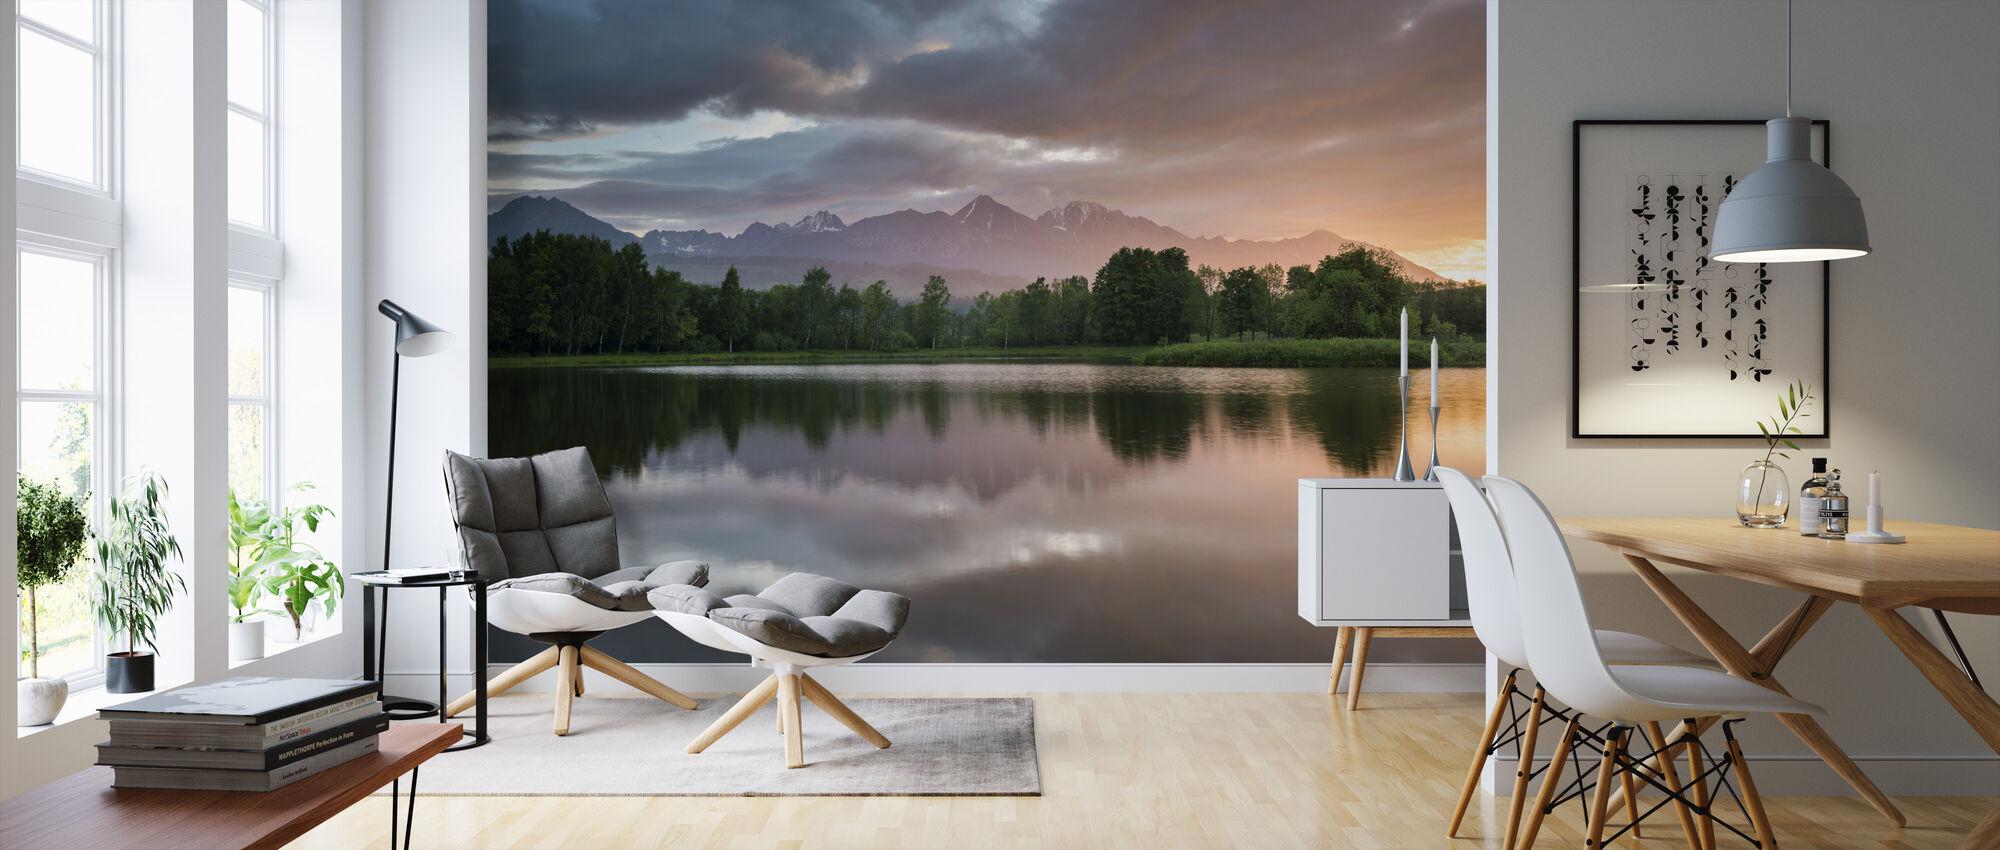 Tatra Mountains - Wallpaper - Living Room